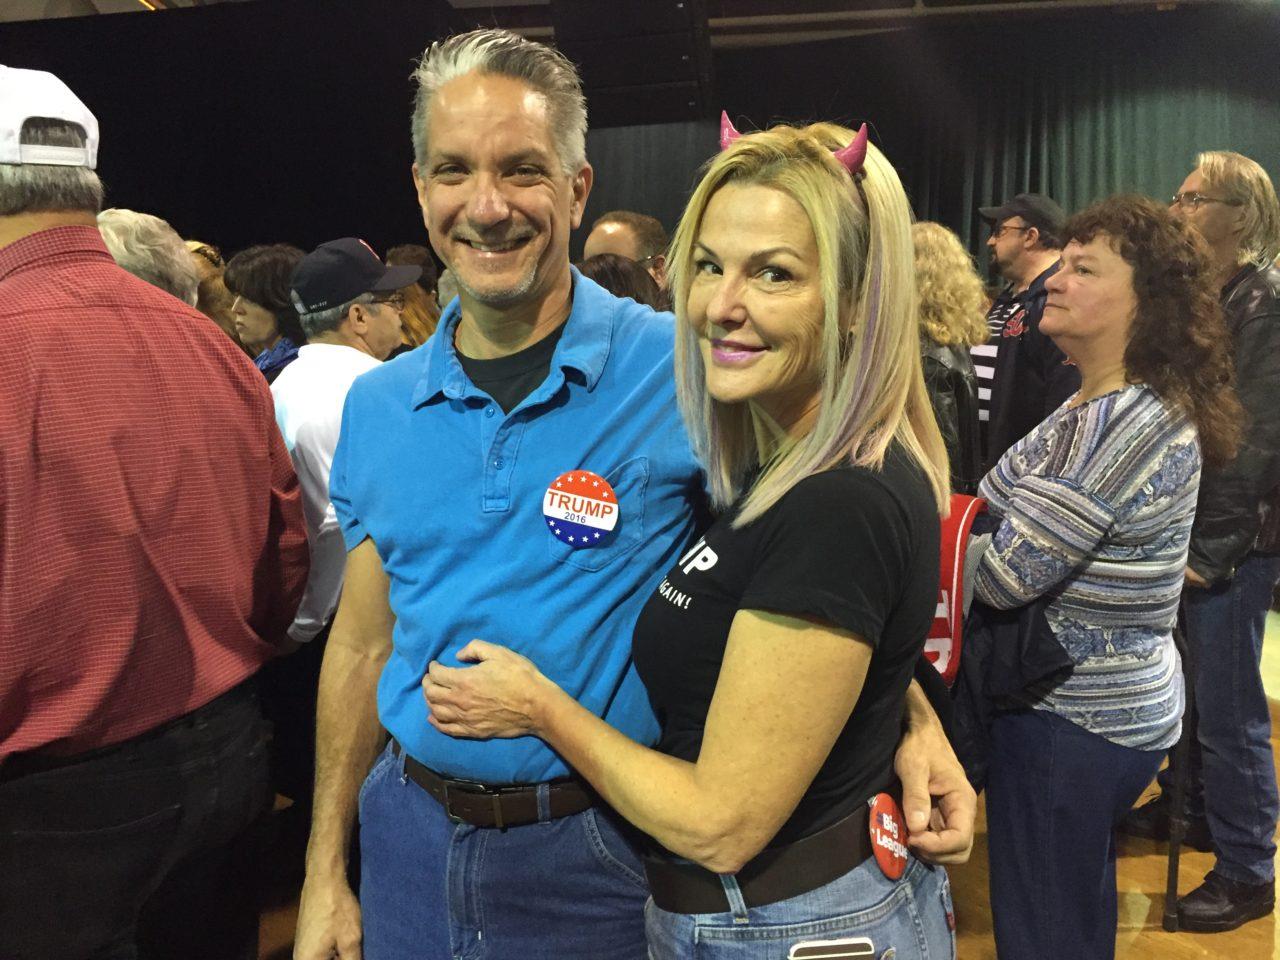 Donald Trump rally in NH (Joel Pollak / Breitbart News)